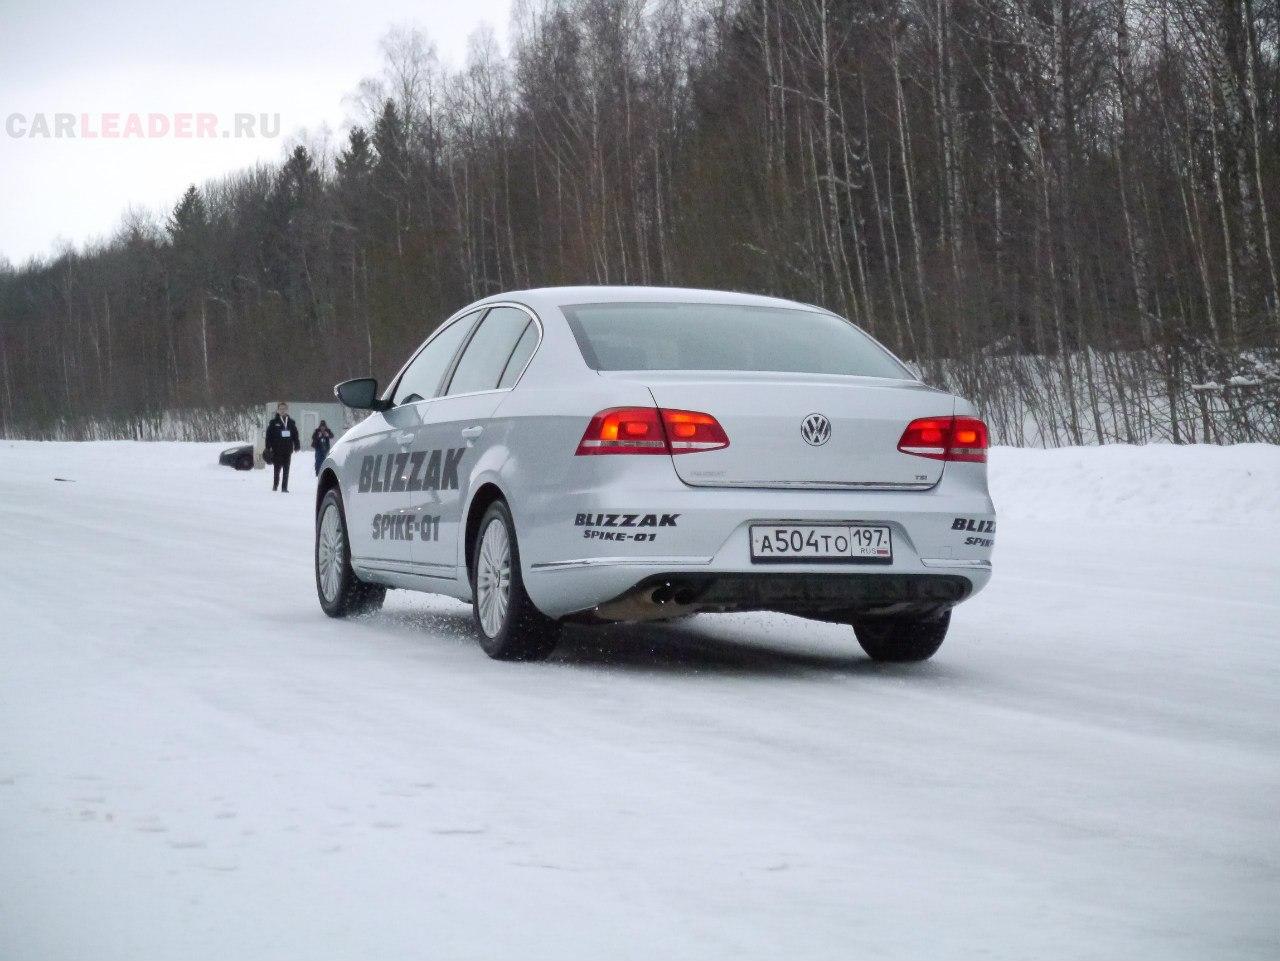 VW Passat 2012 Spyke-01